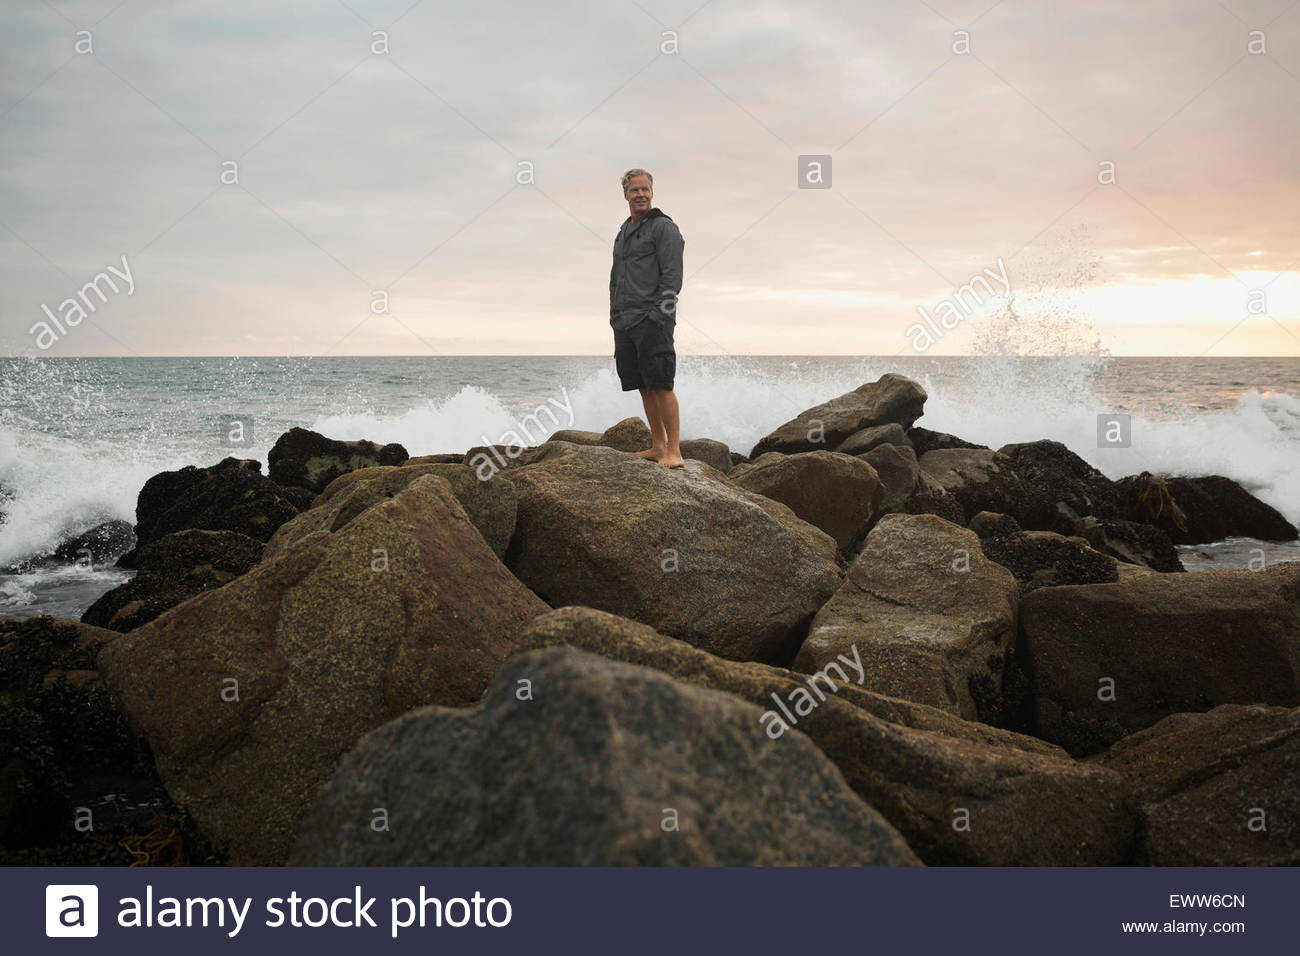 Ocean salpicaduras de rocas detrás de hombre al atardecer Imagen De Stock